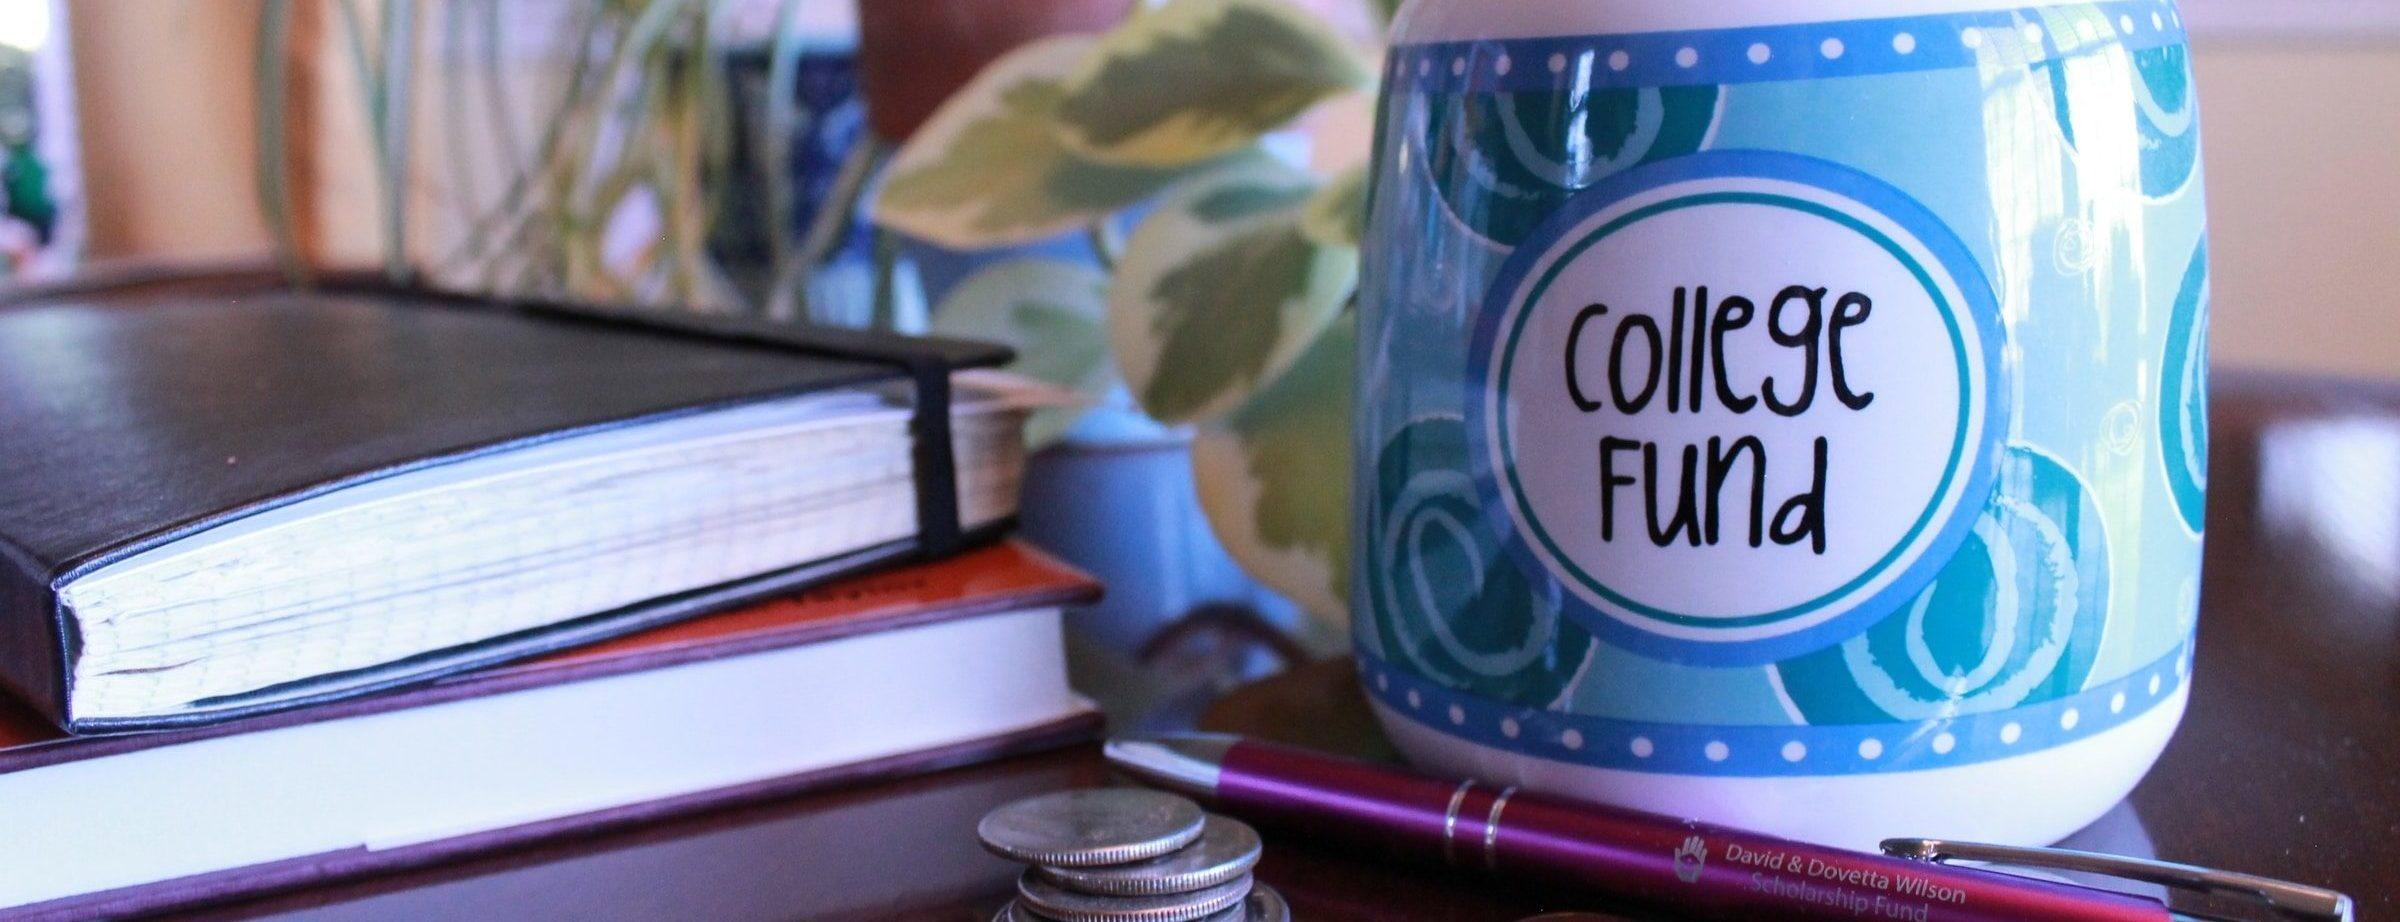 The David & Dovetta Wilson Scholarship Fund, Inc.